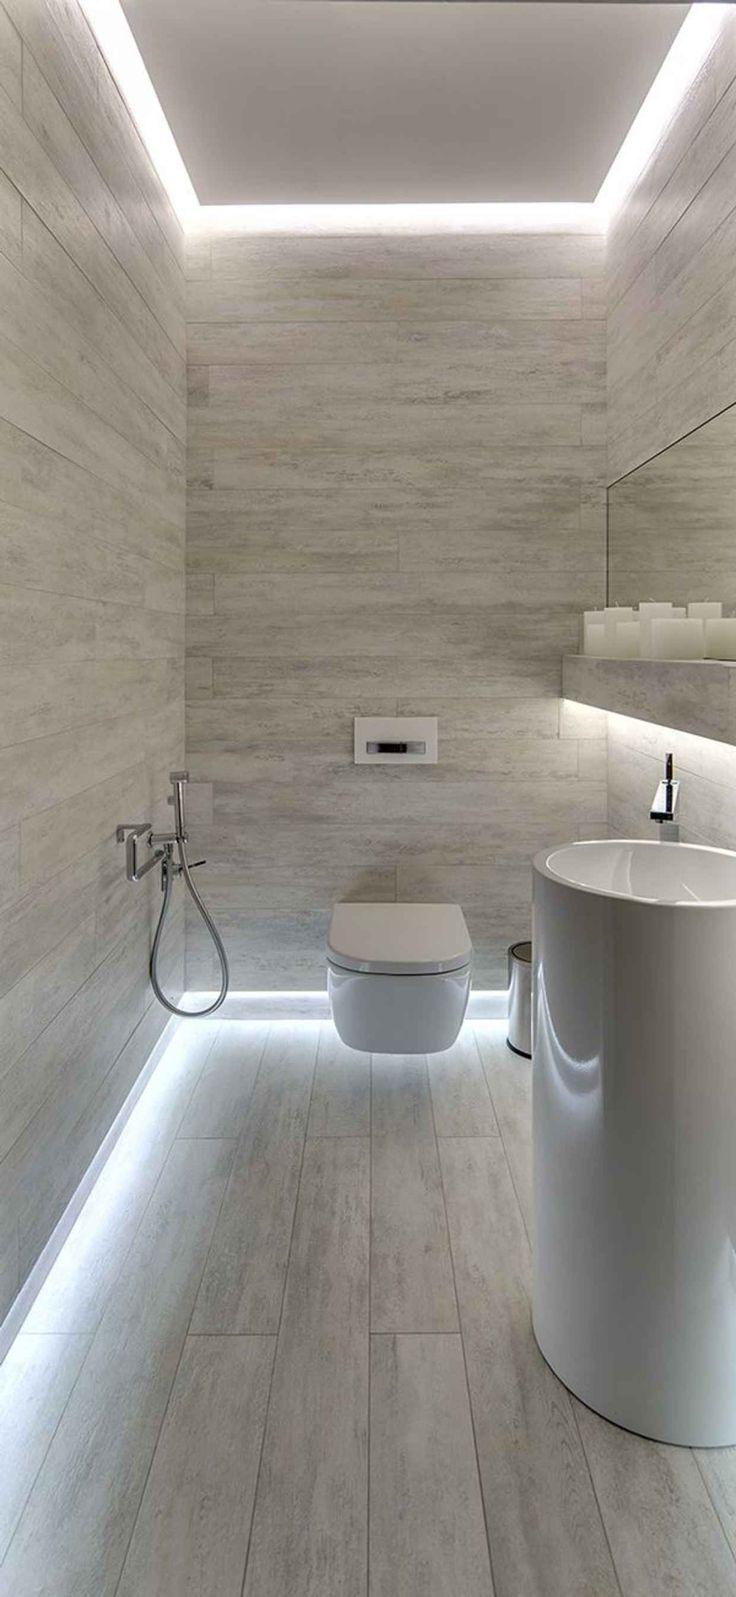 Best  Modern Toilet Design Ideas On Pinterest Modern - Modern toilet design